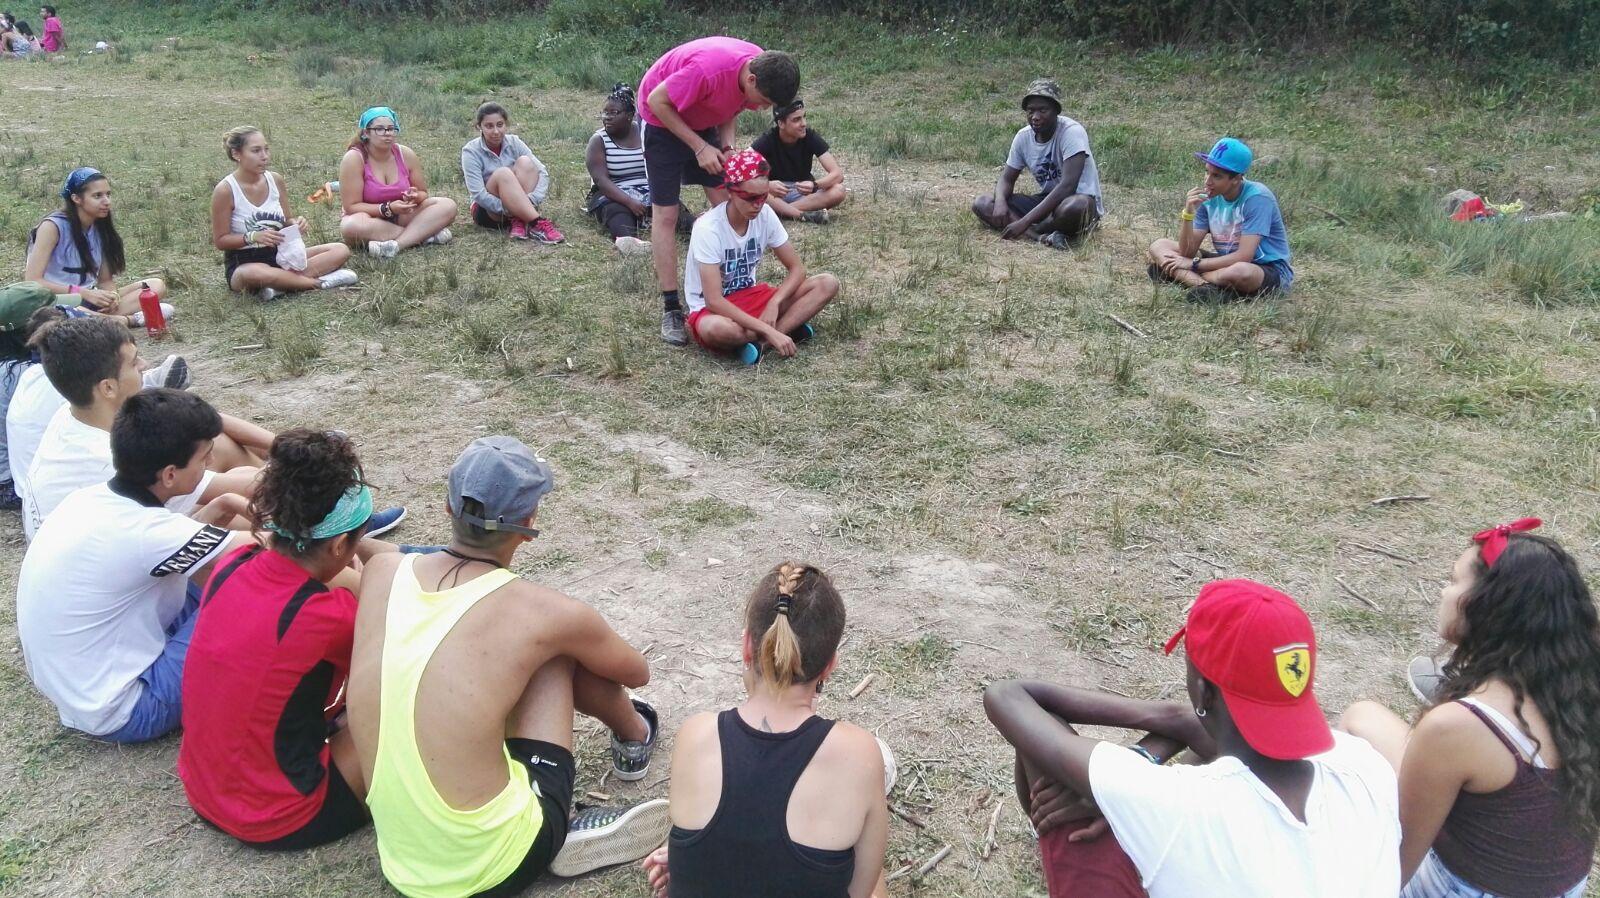 CaMPaMeNTo CHeSo: Primer día en Cheso